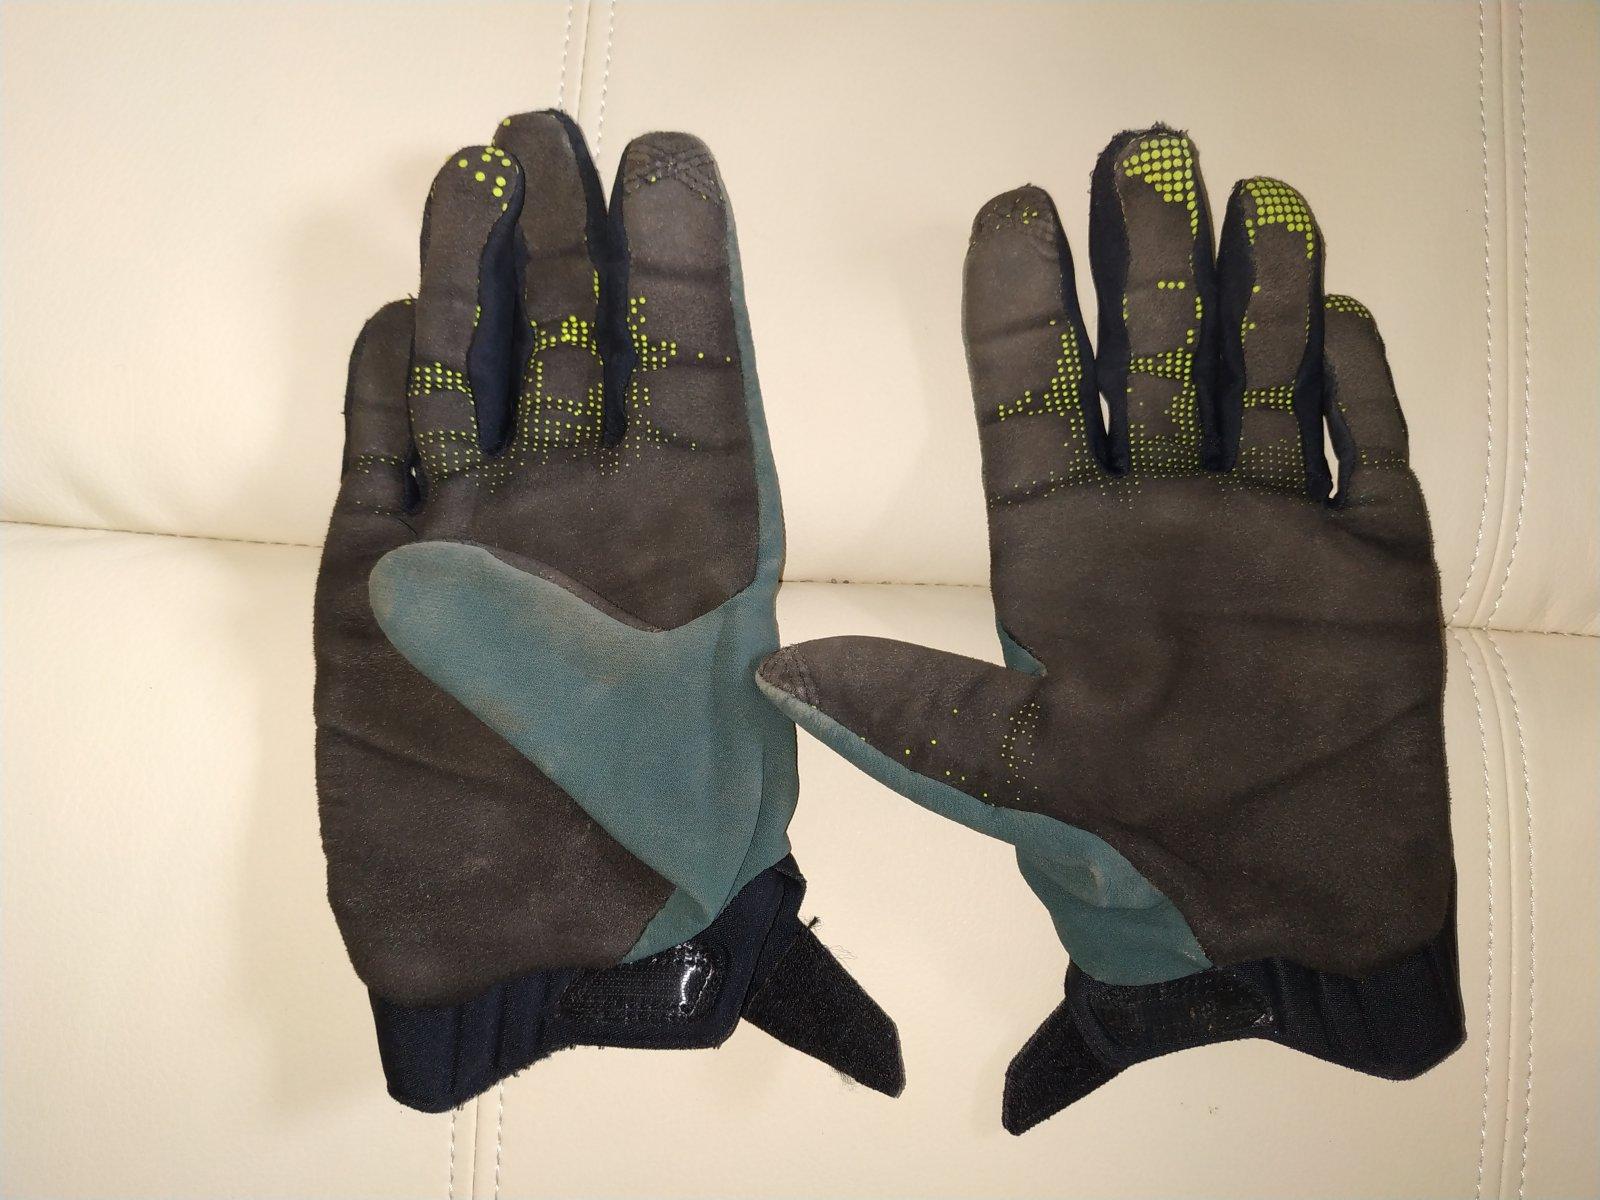 Fox Defend Fire Handschuhe-used (1).jpg